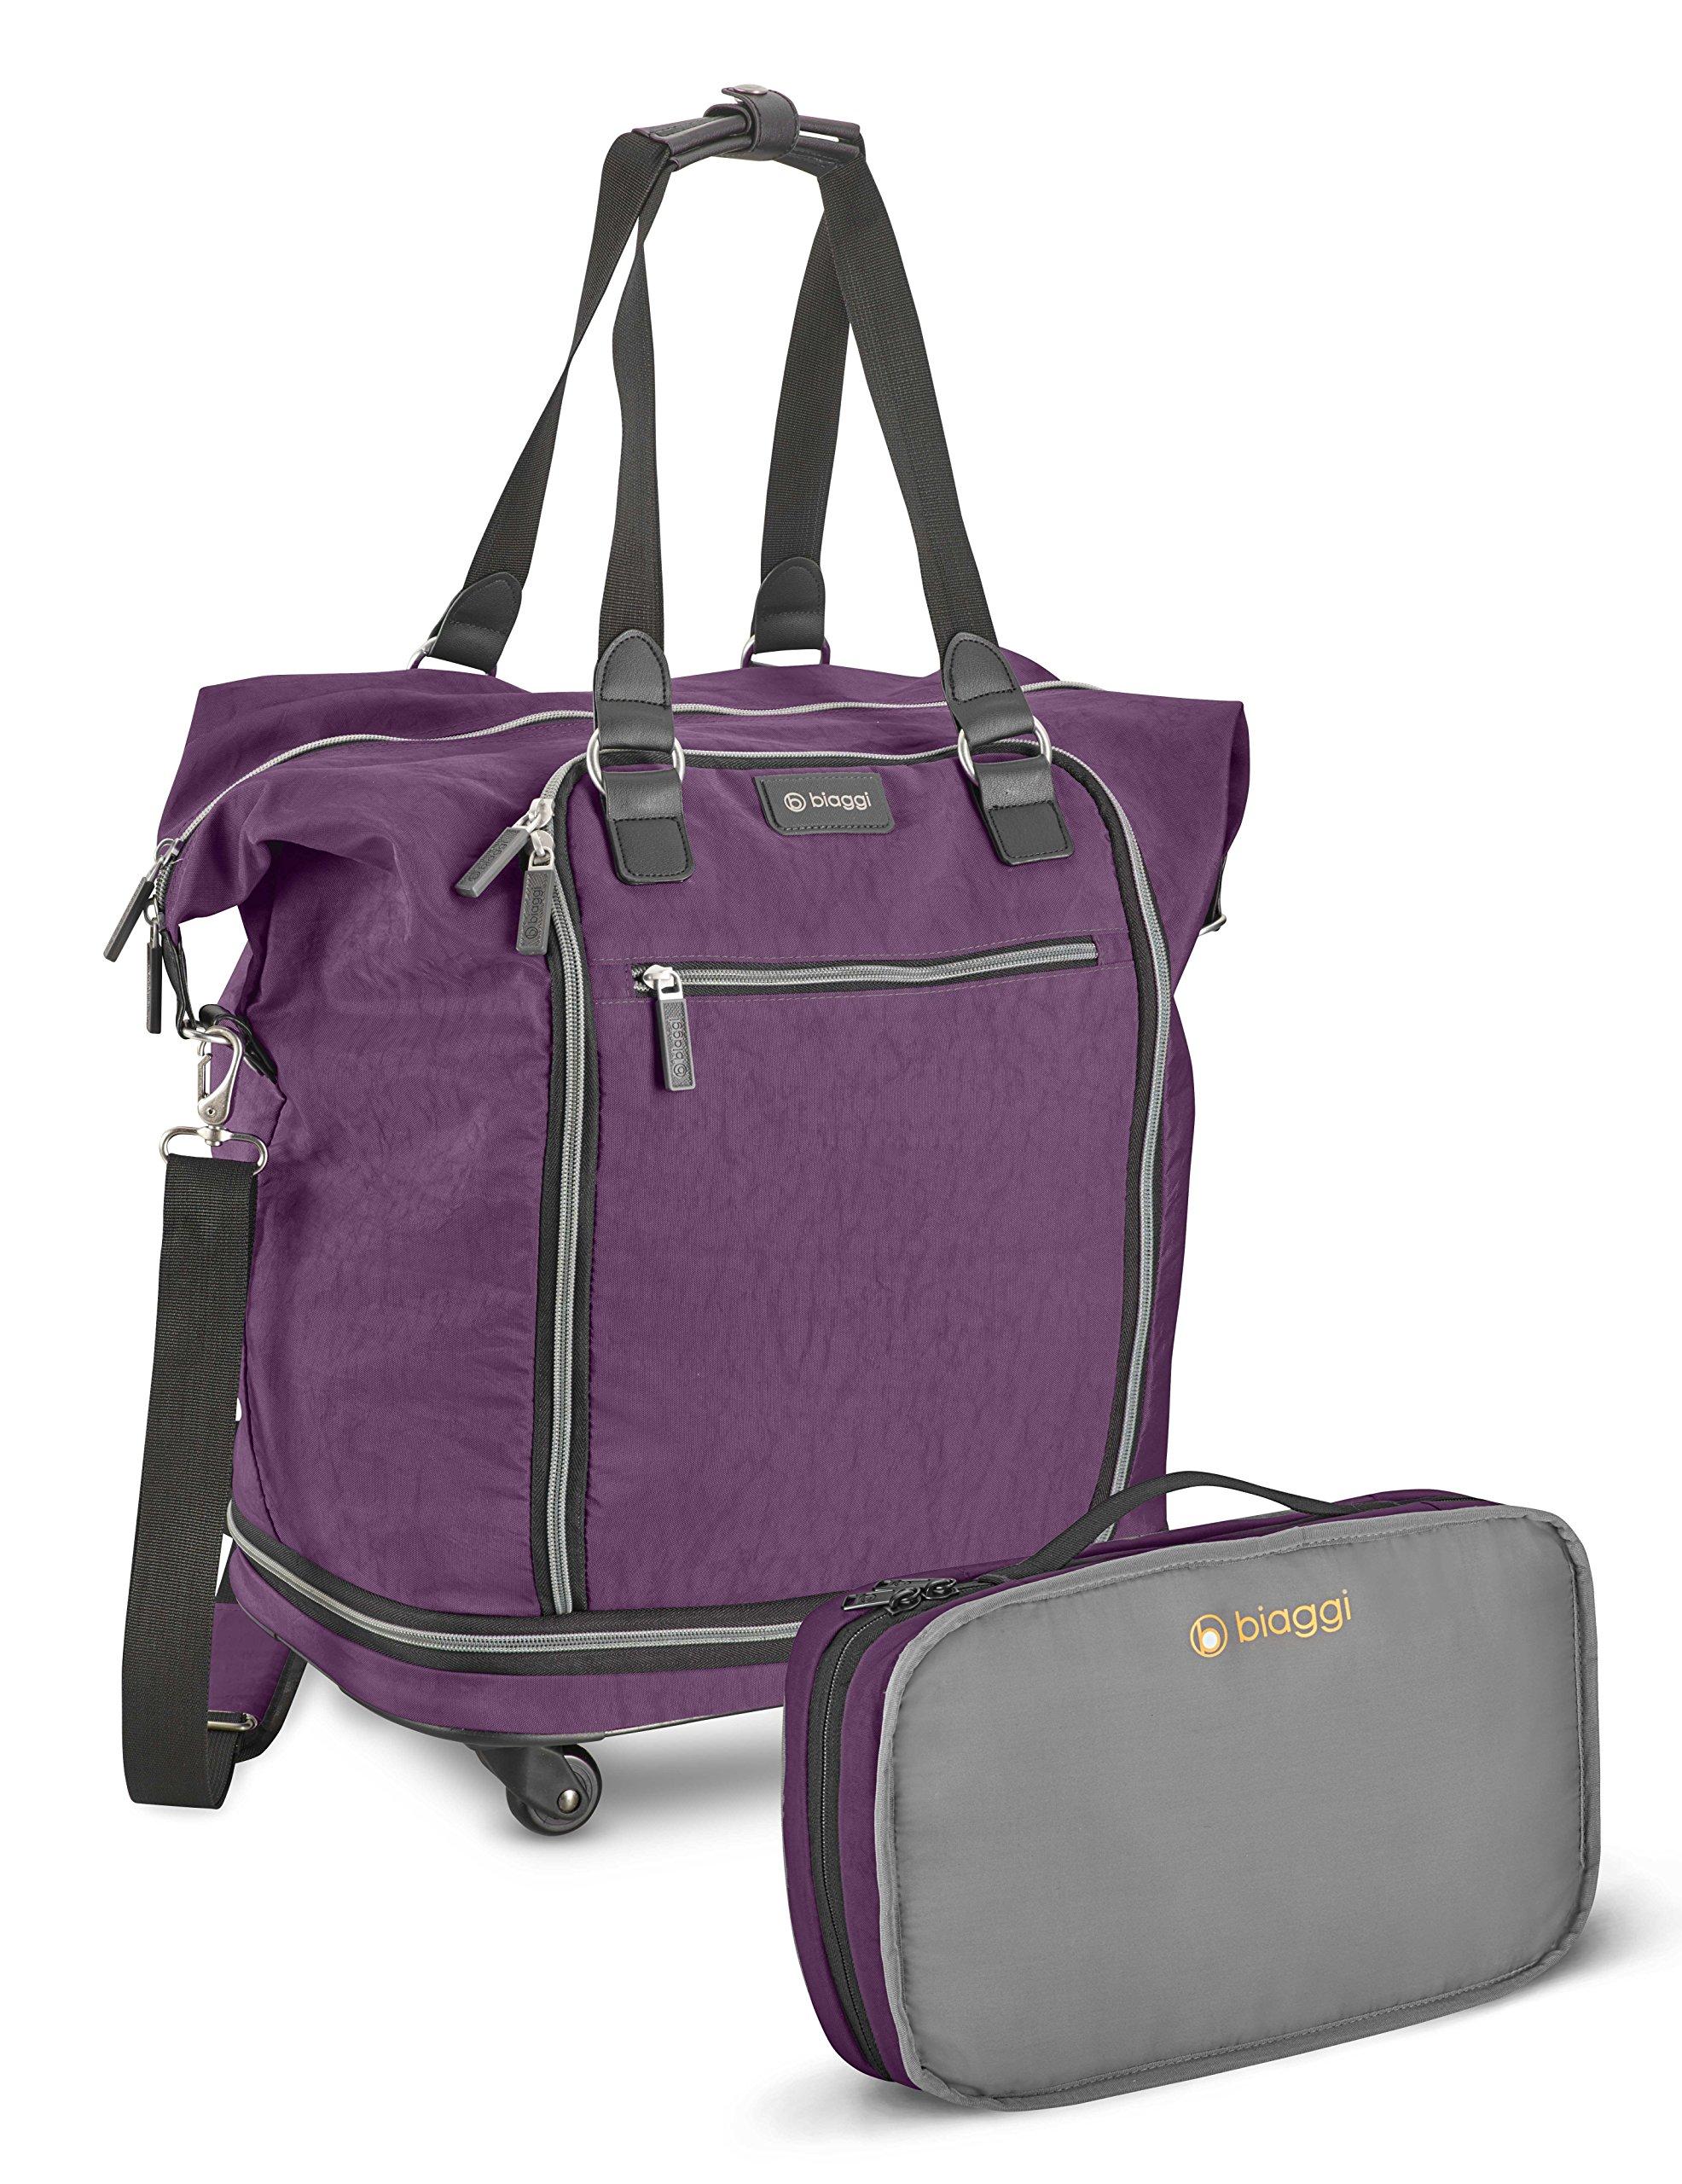 Biaggi Zipsak Micro Fold Spinner Fashion Tote - 20-Inch Luggage - As Seen on Shark Tank - Purple